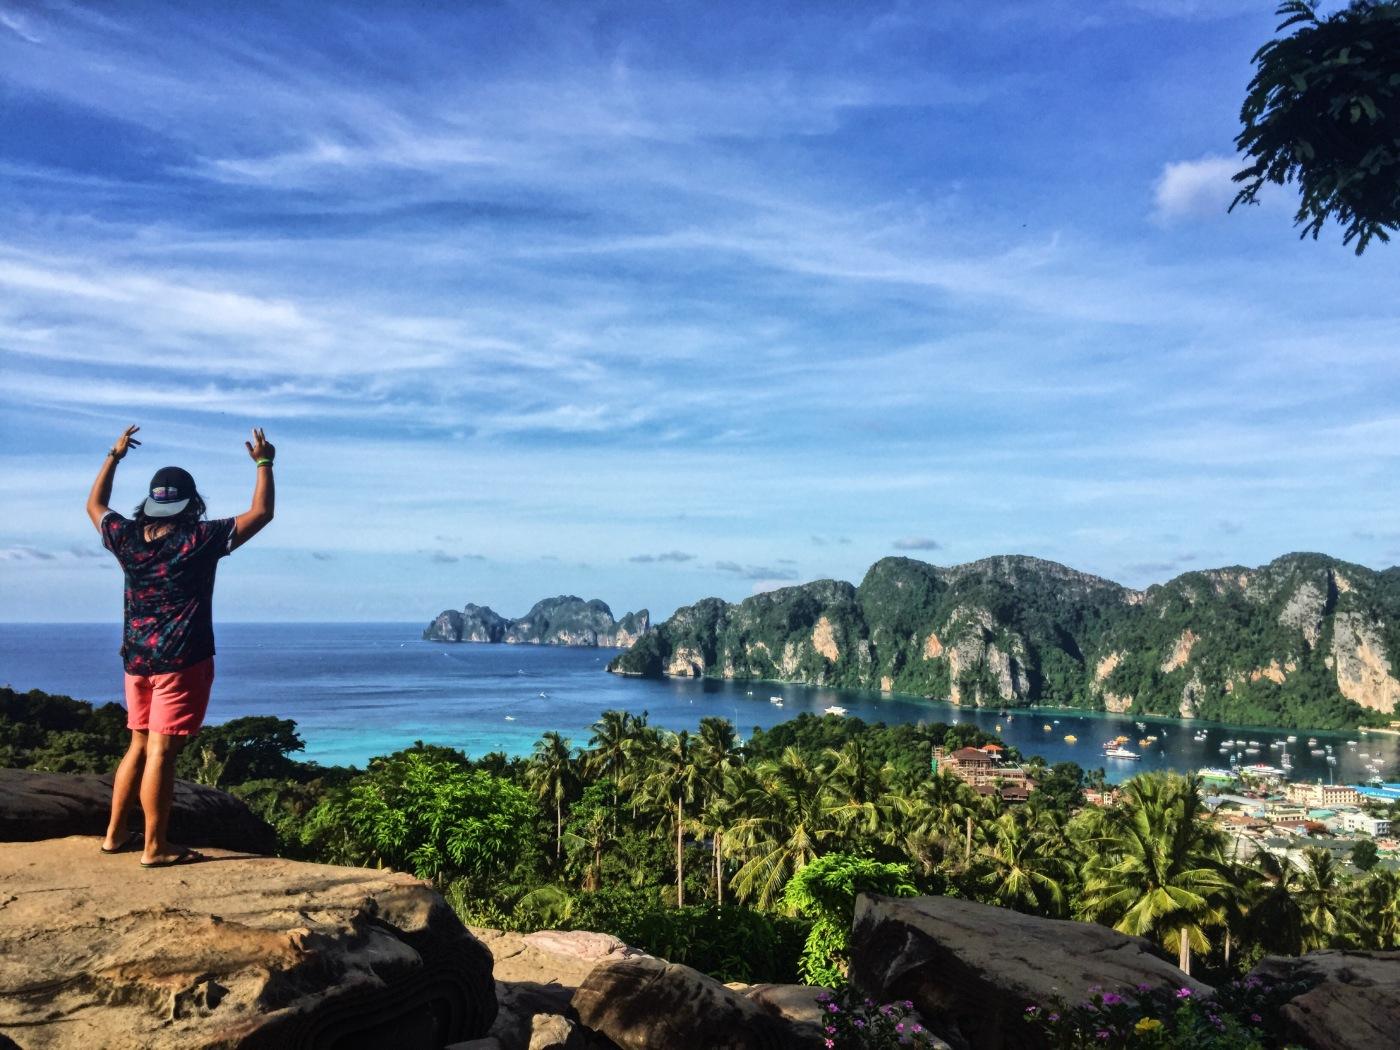 koh phi phi thailand viewpoint